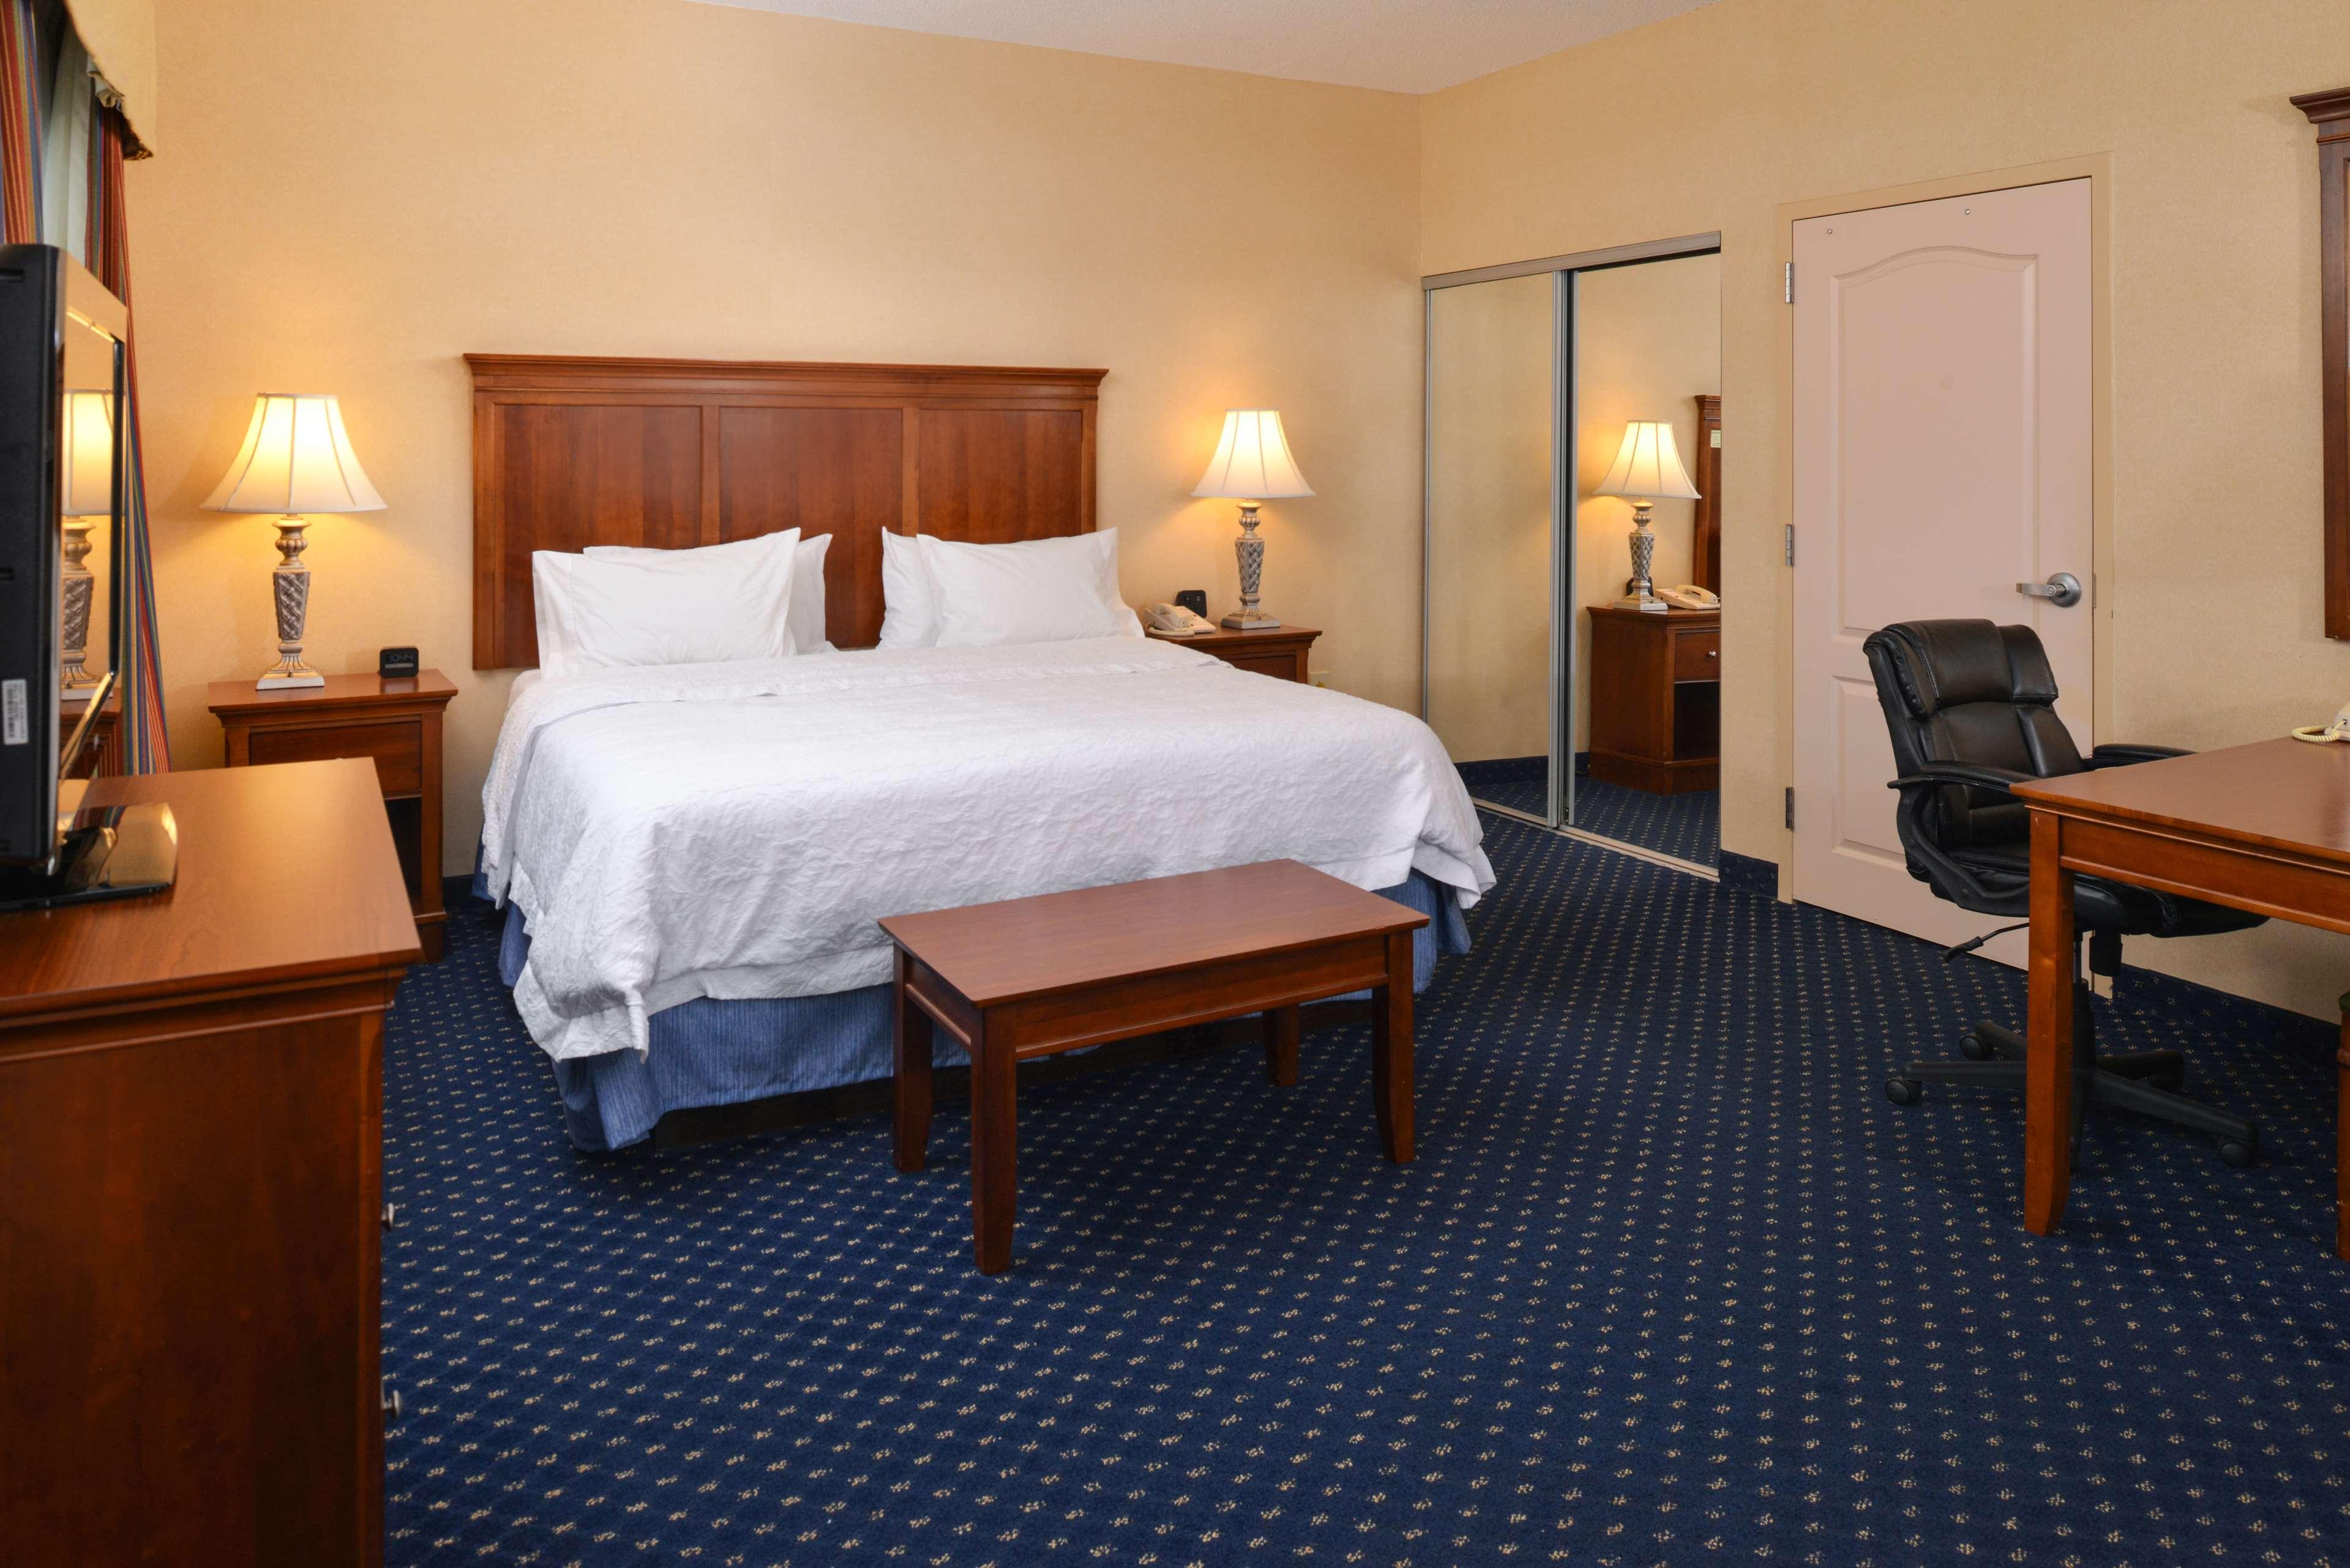 Hampton Inn & Suites Fredericksburg South image 36